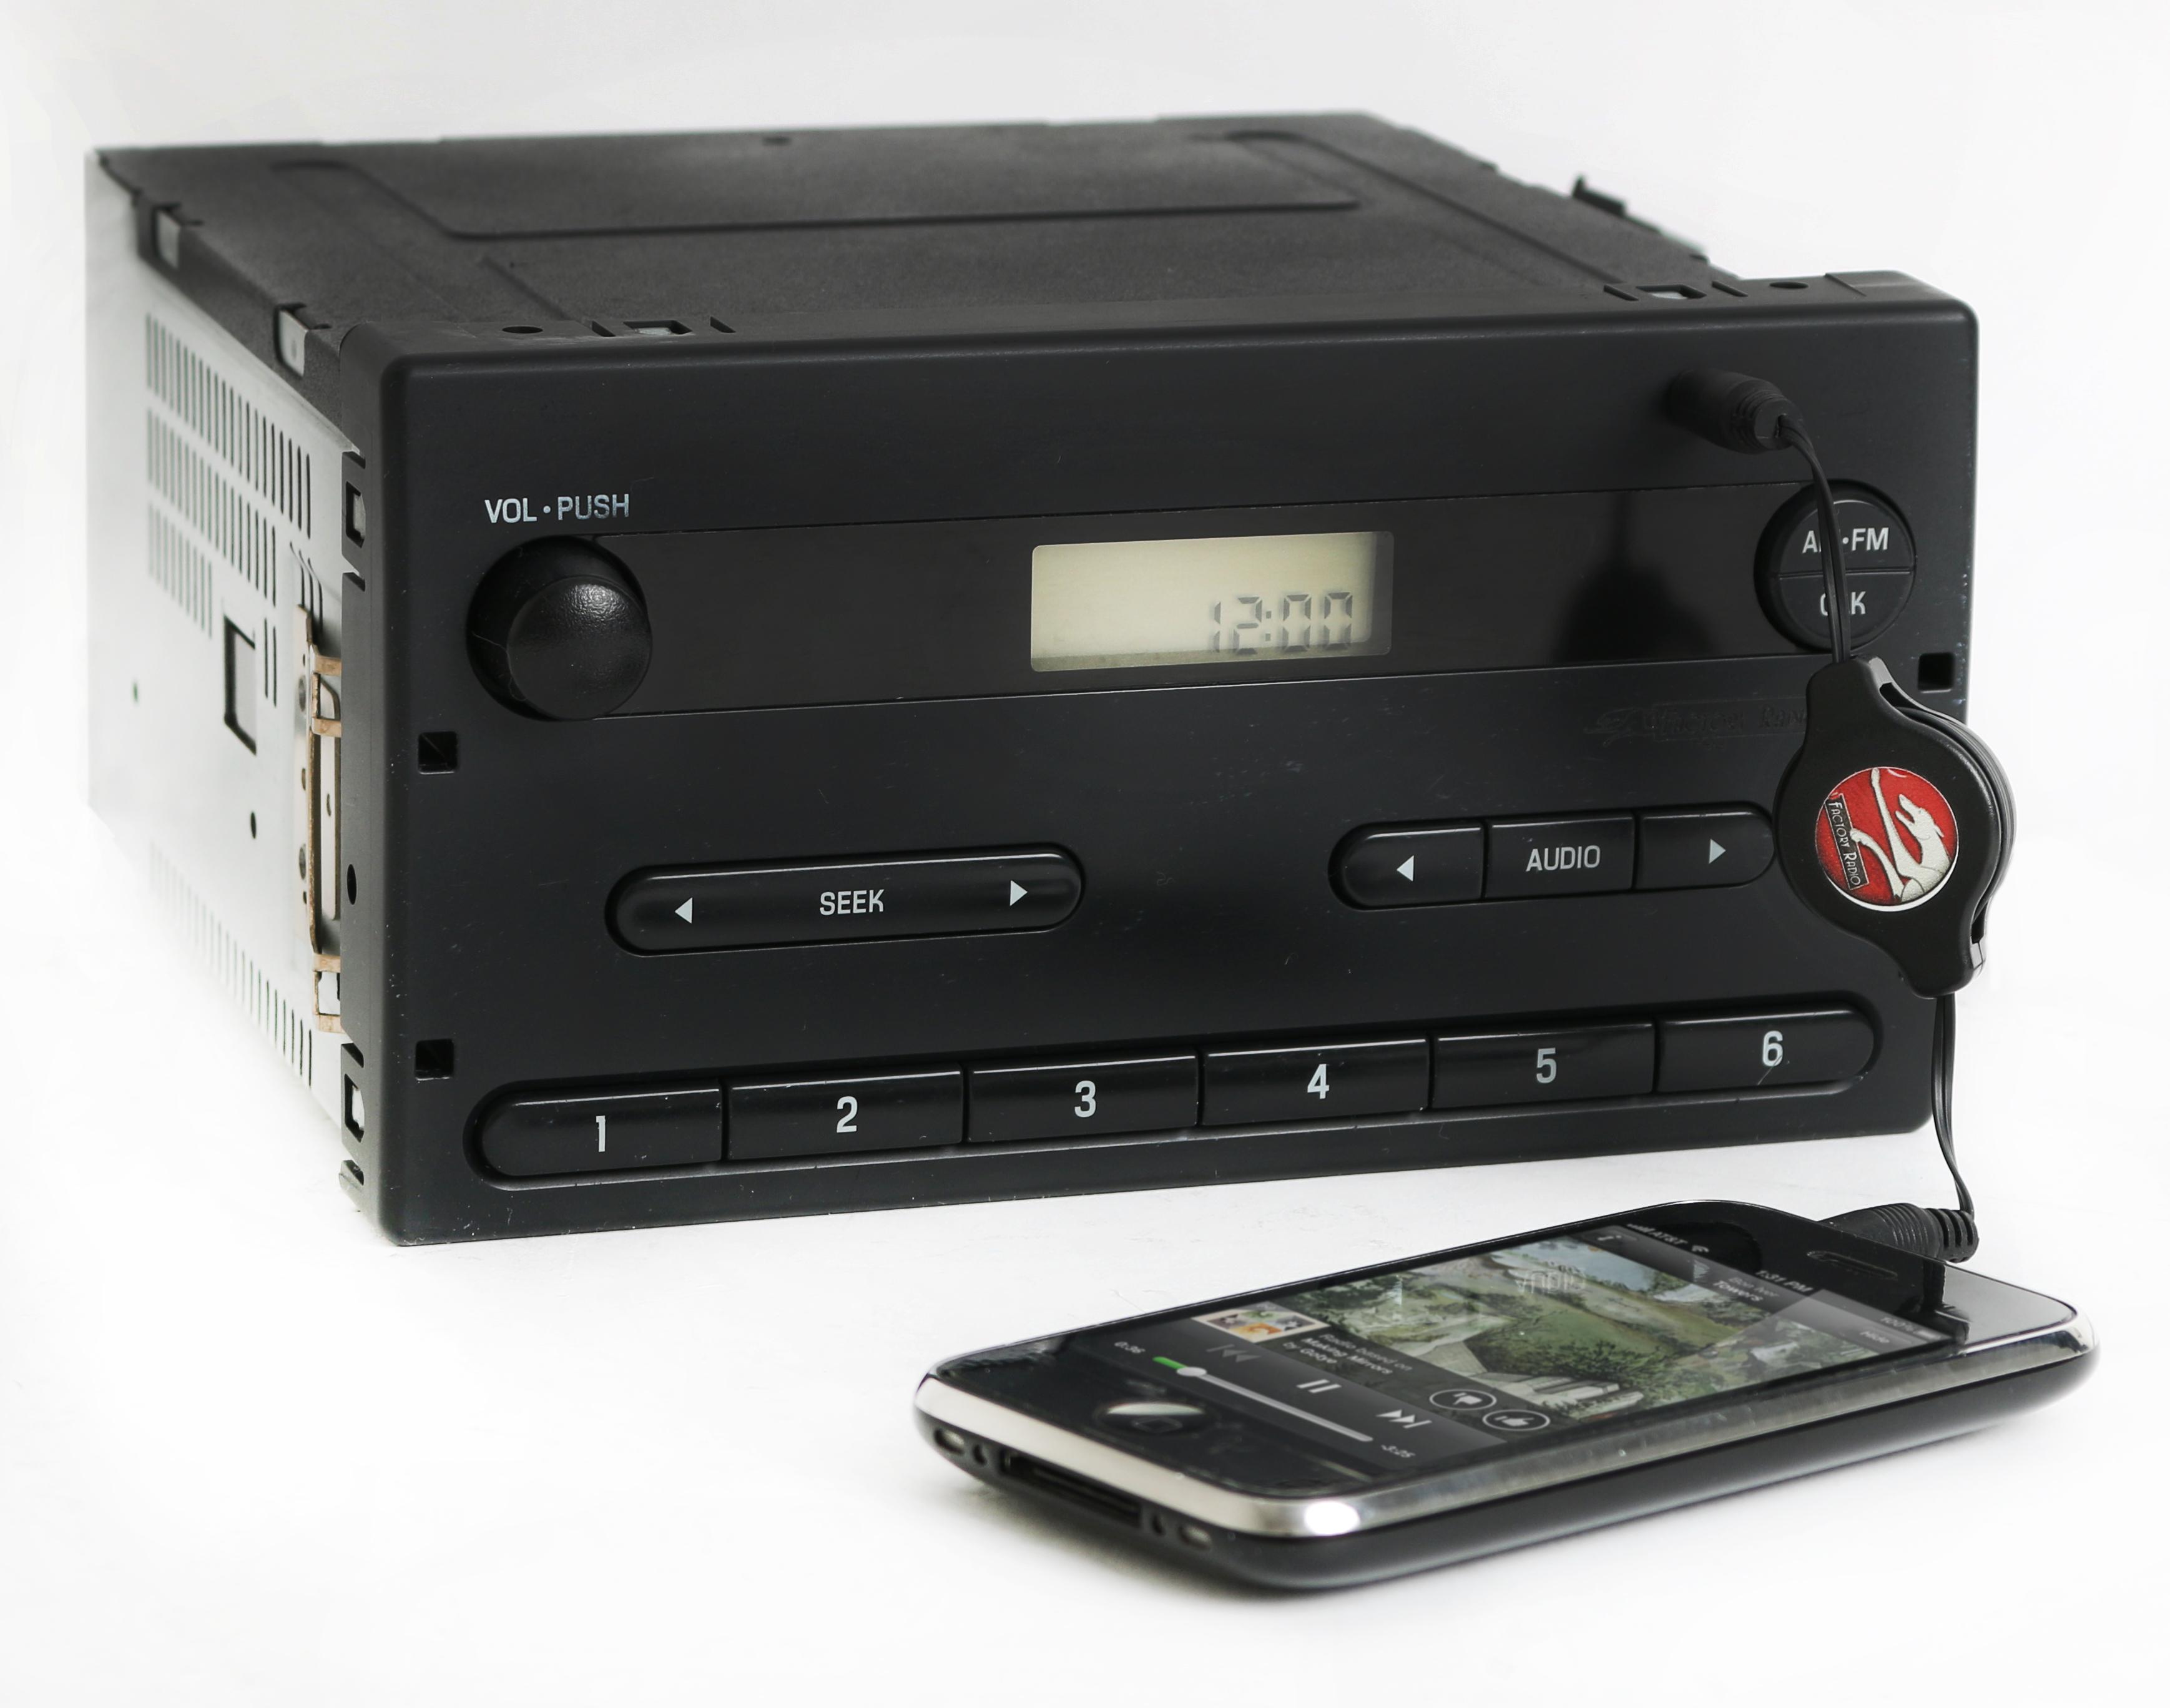 Ford Motor Company Ford Ranger Mazda 2004-2011 Radio AM FM Upgraded w Aux iPod Input 6L5T-18K810-AA at Sears.com